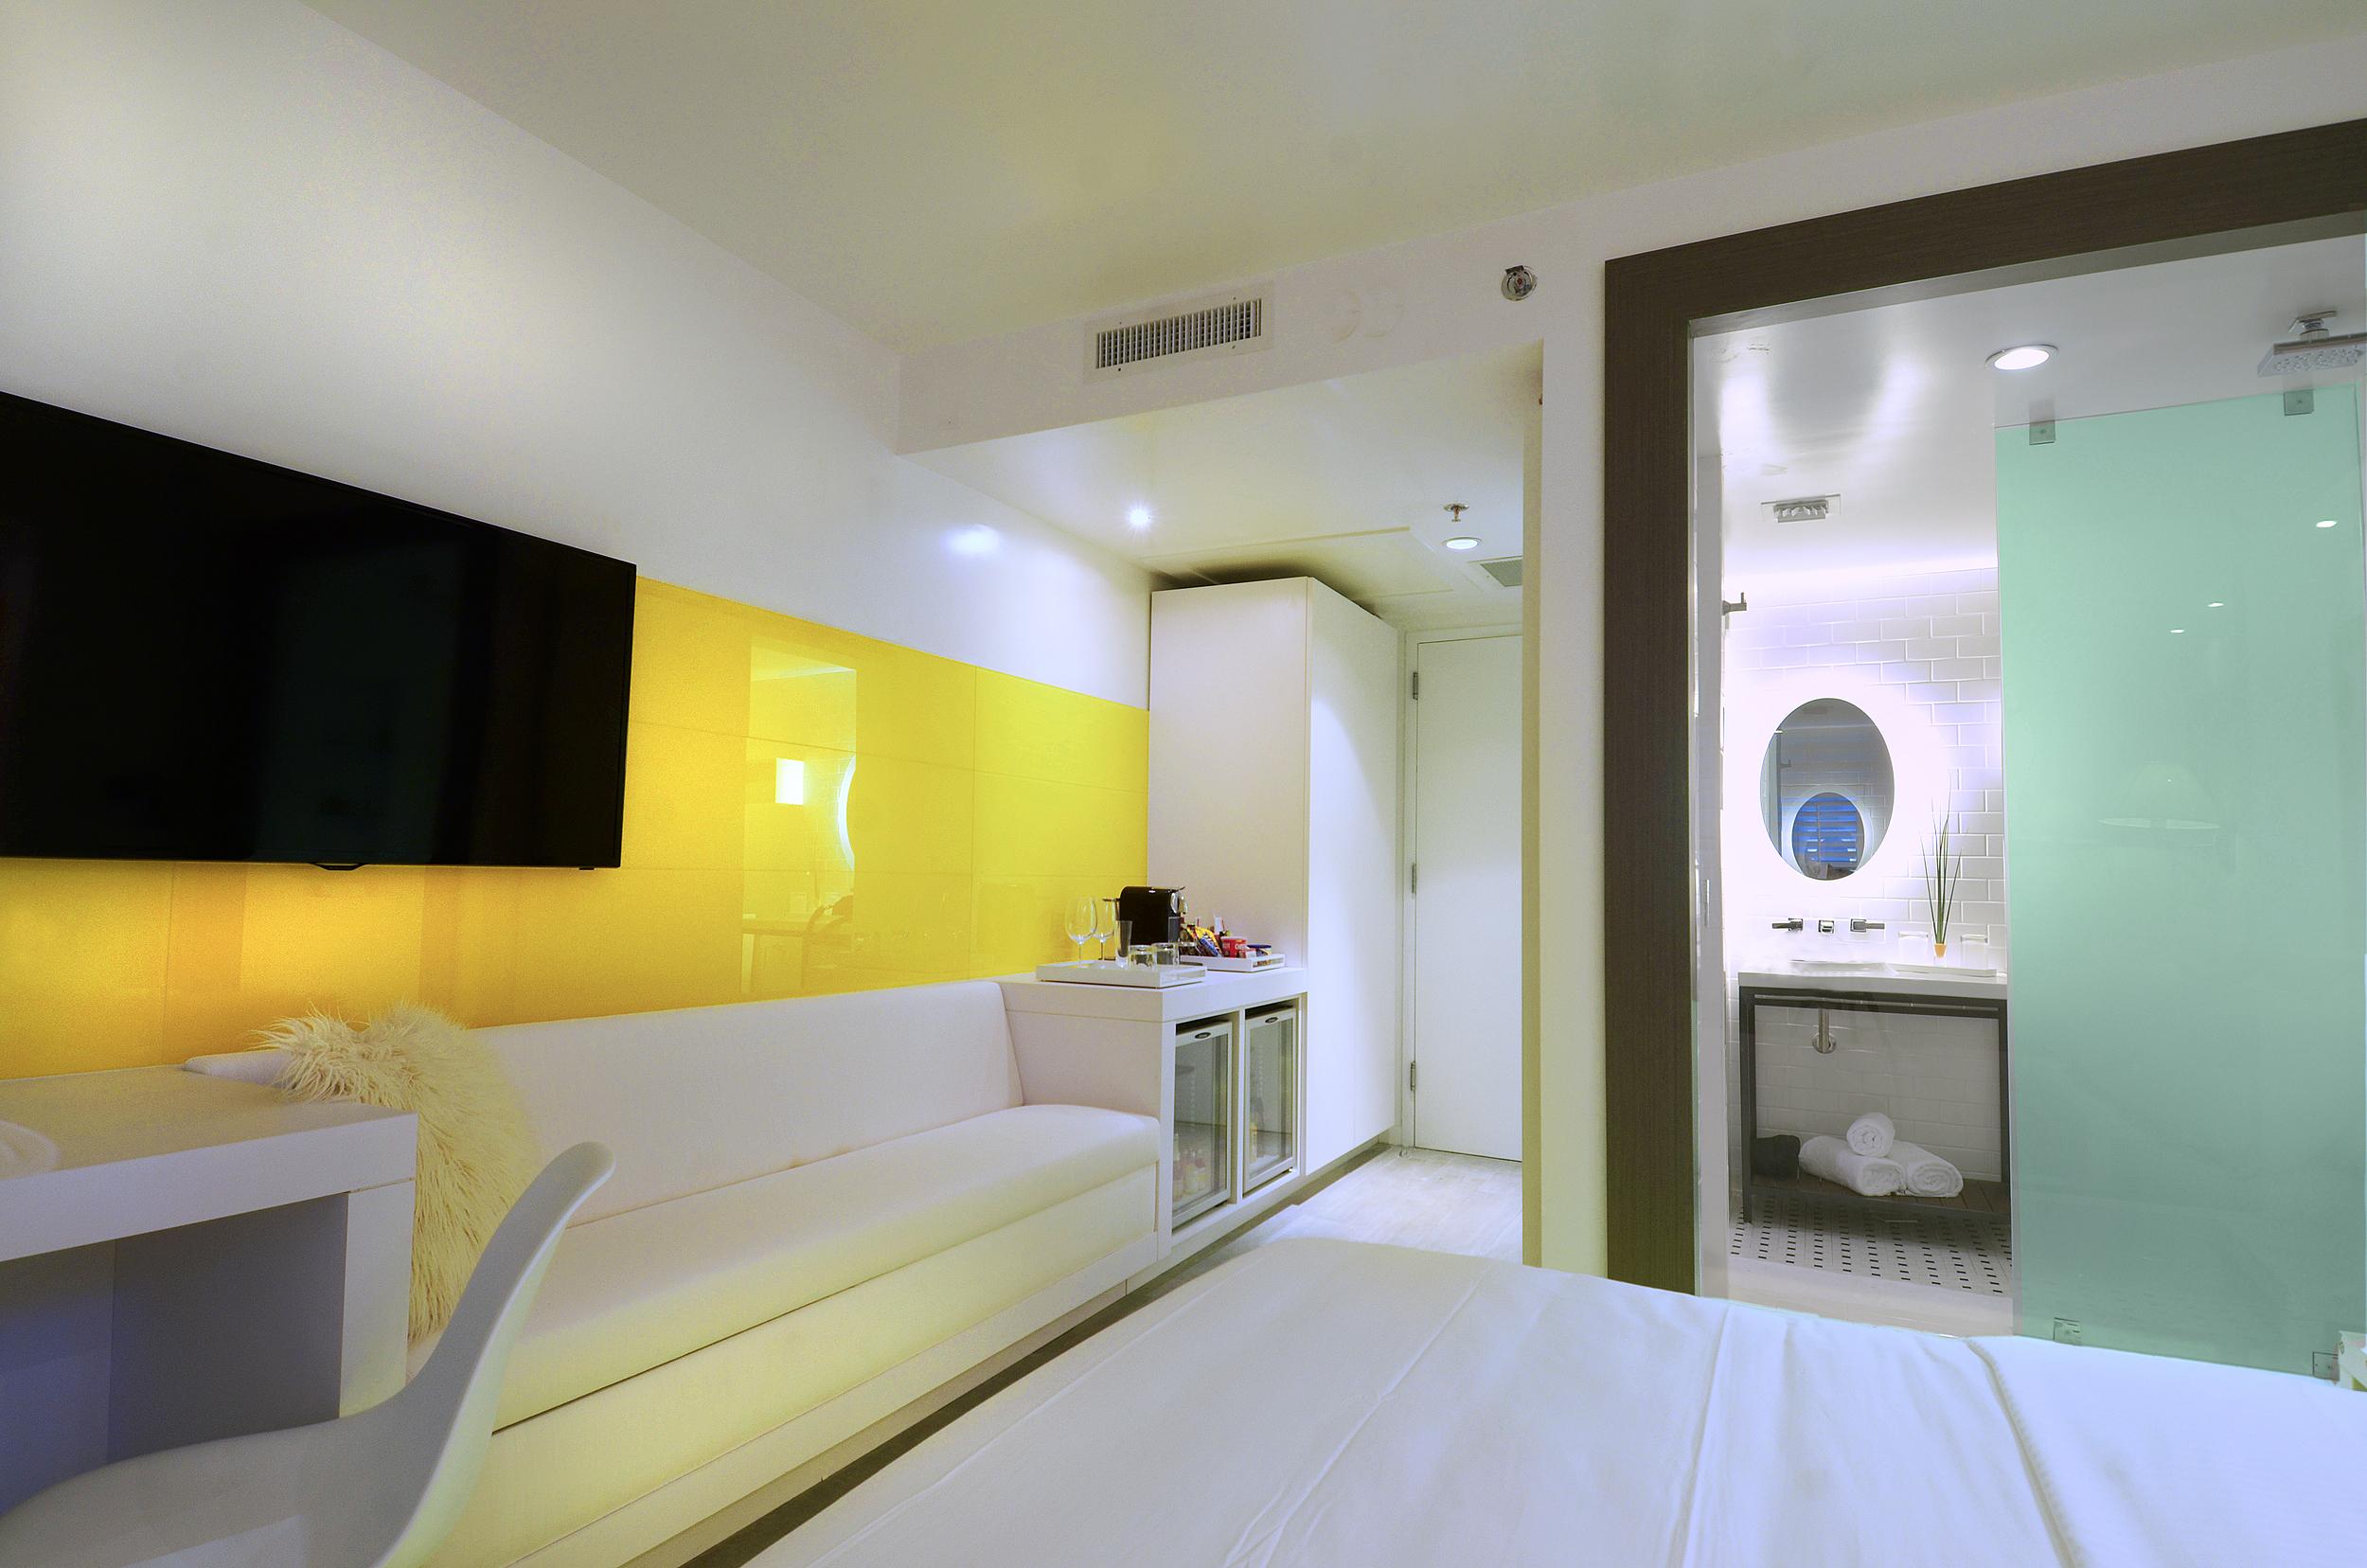 Room_1729.jpg